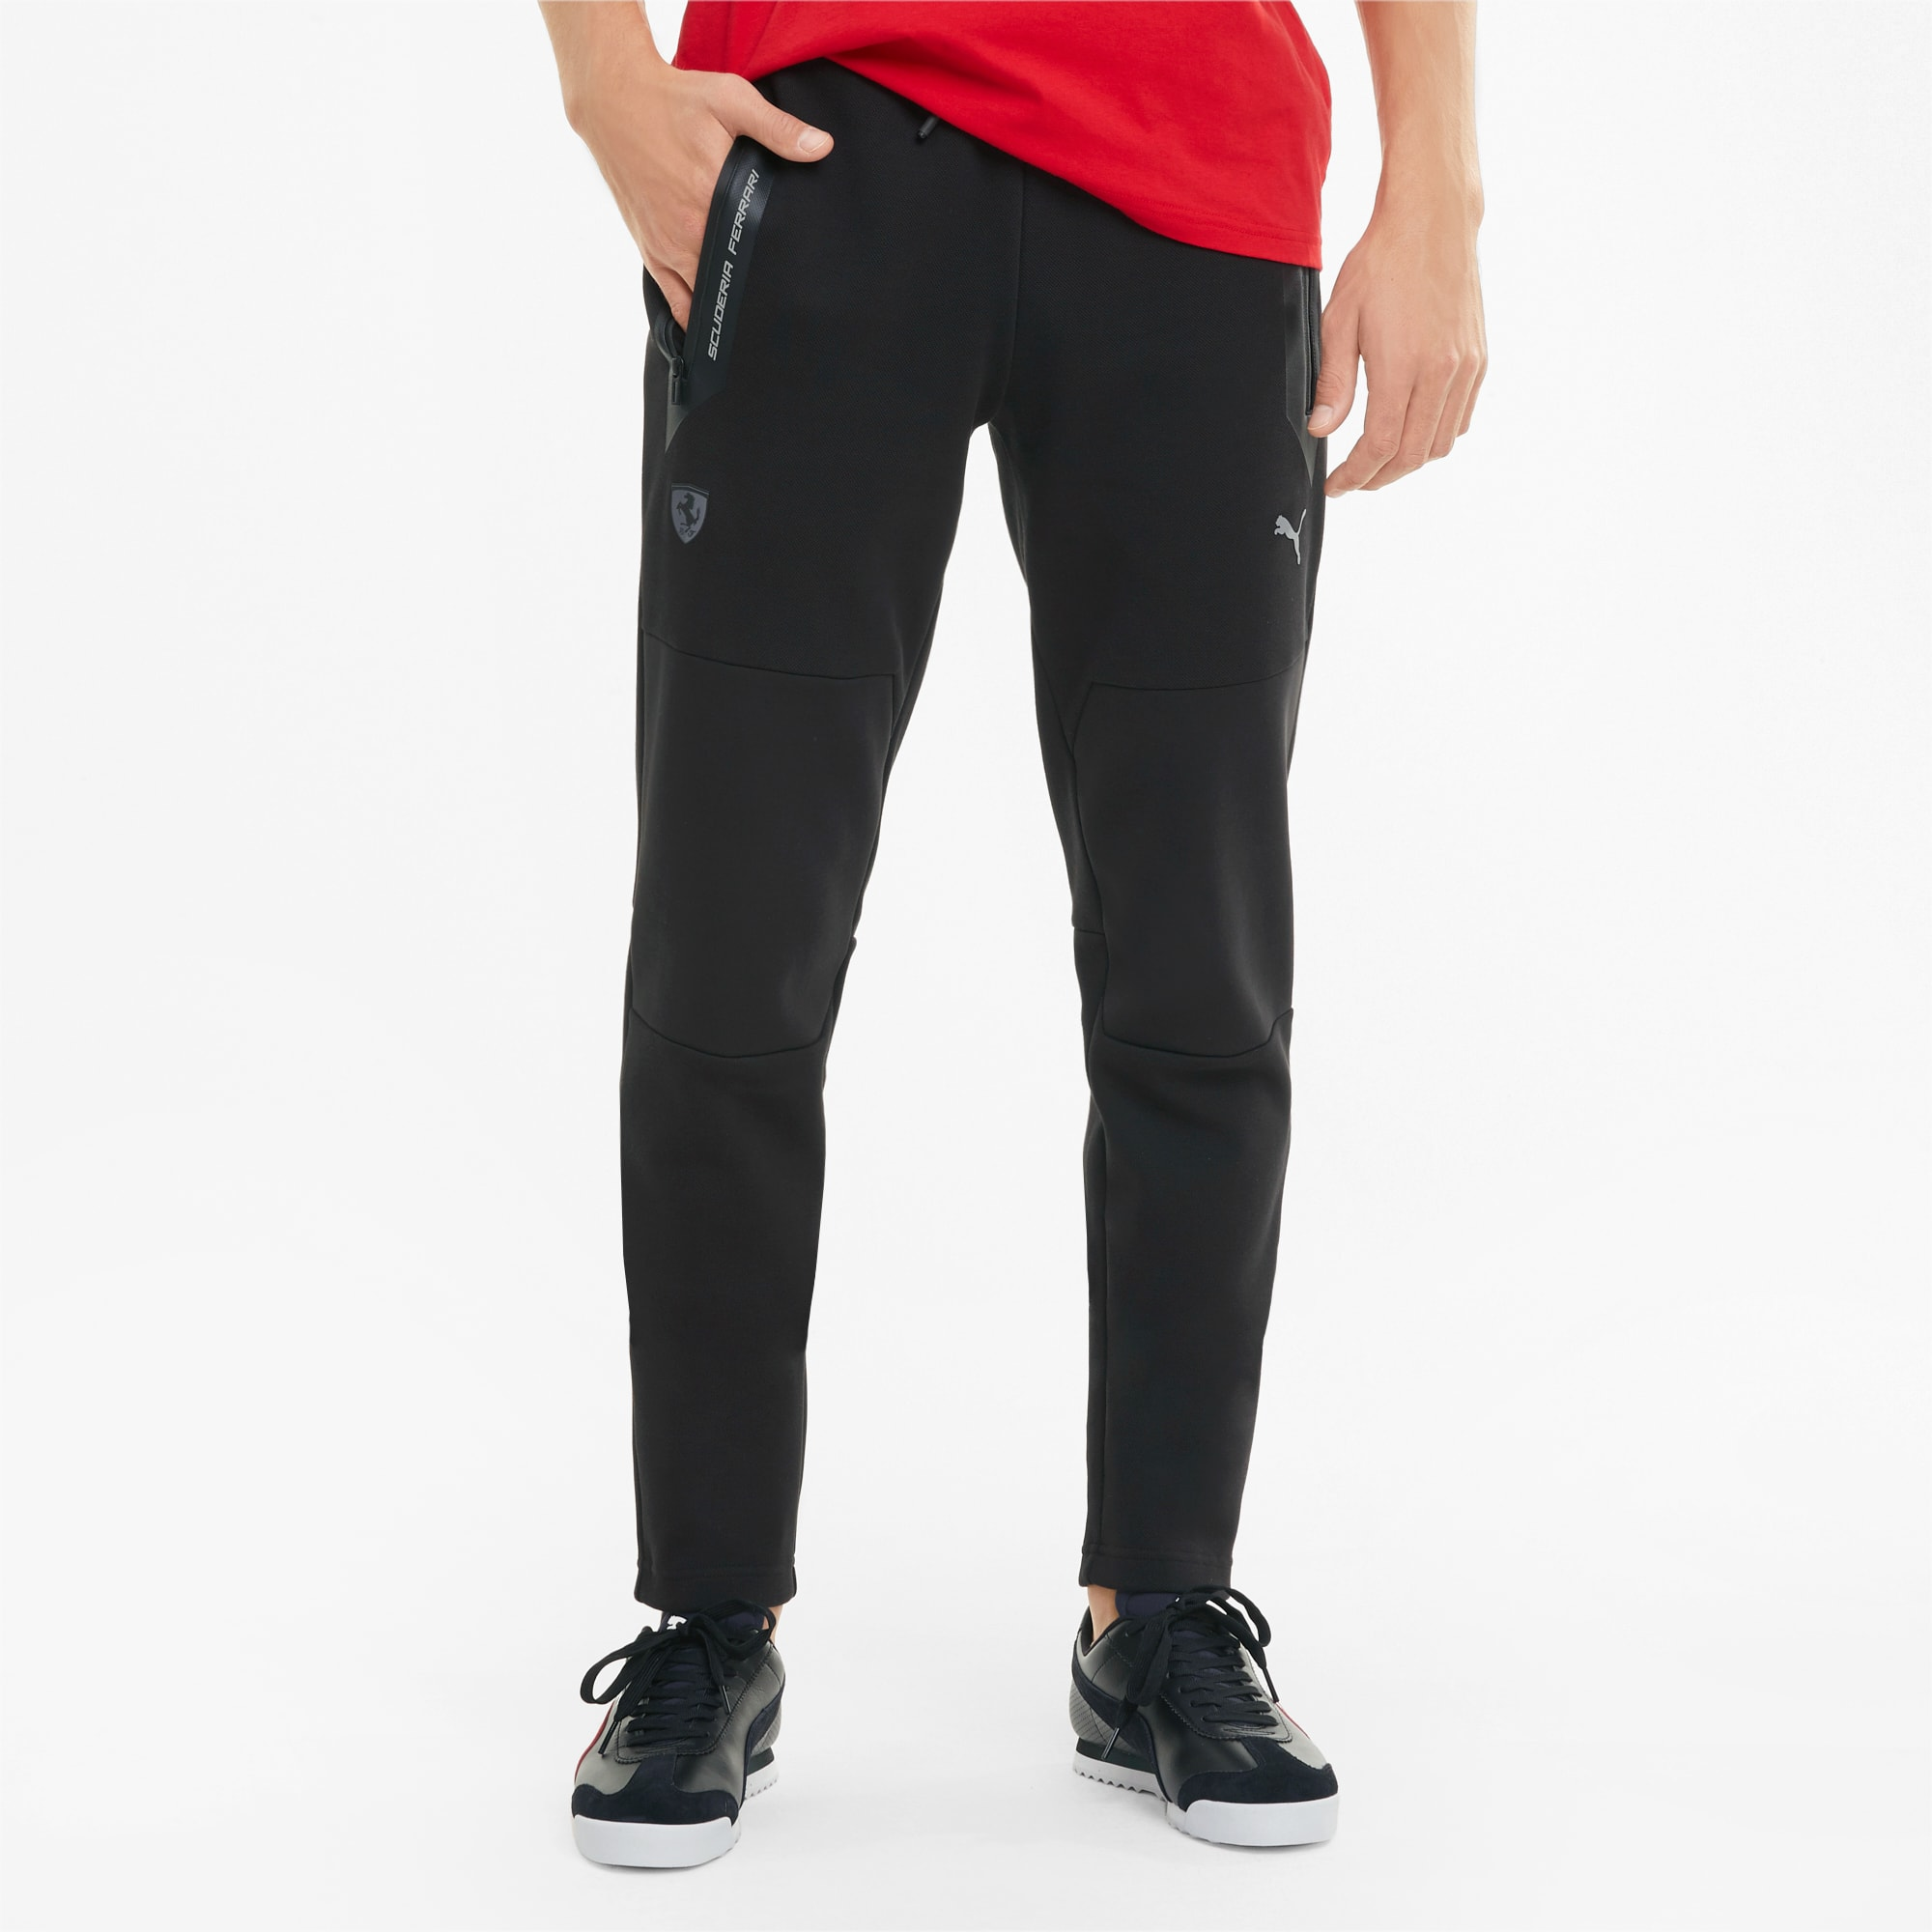 PUMA Scuderia Ferrari Style Herren Sweatpants | Mit Aucun | Schwarz | Größe: XXL